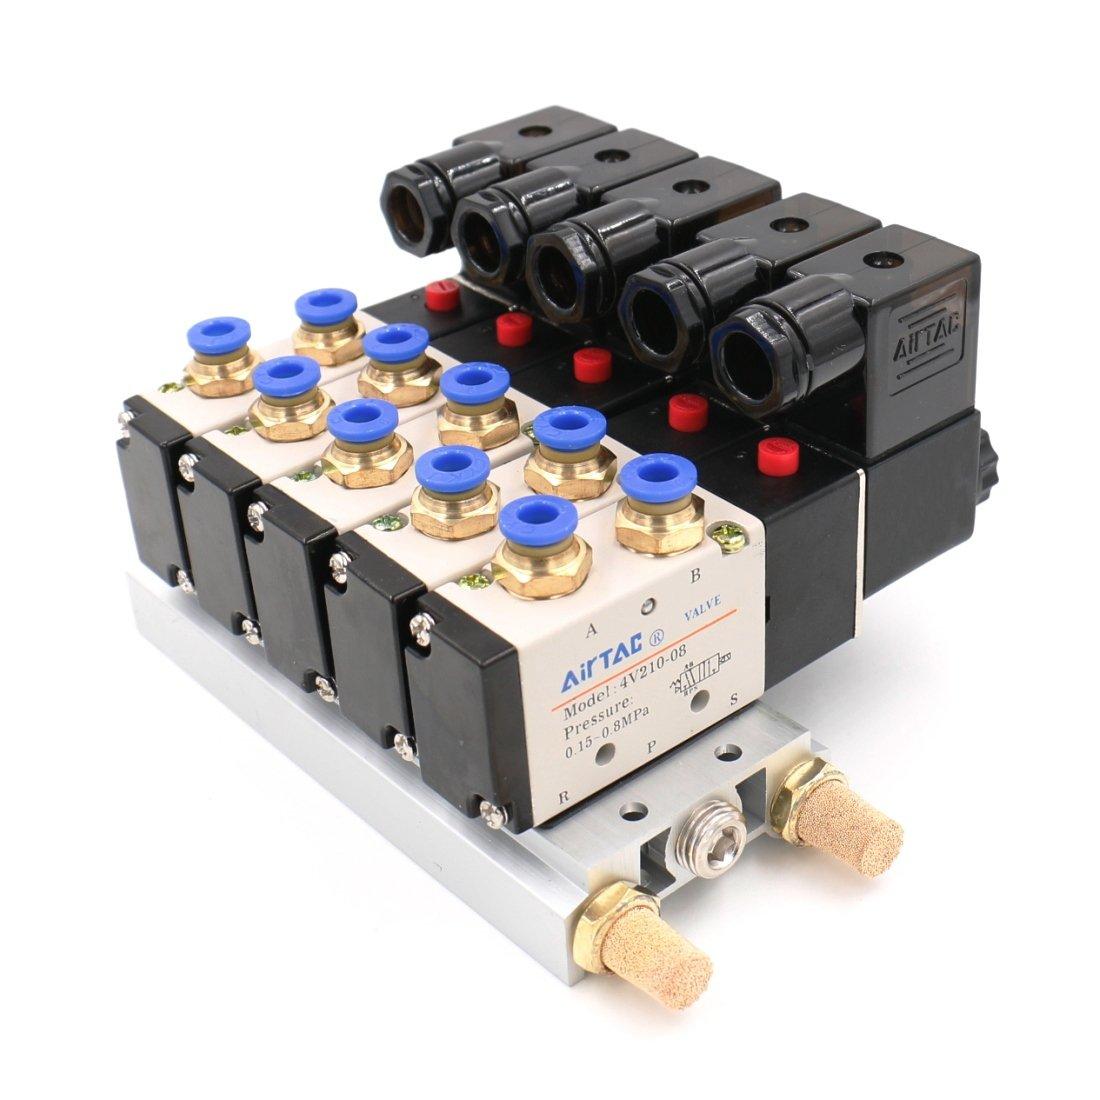 Baomain Pneumatic Solenoid Valve 4V210-08 AC 110V PT1//4 5 Way 2 Position Base Quick Fittings Muffler Set